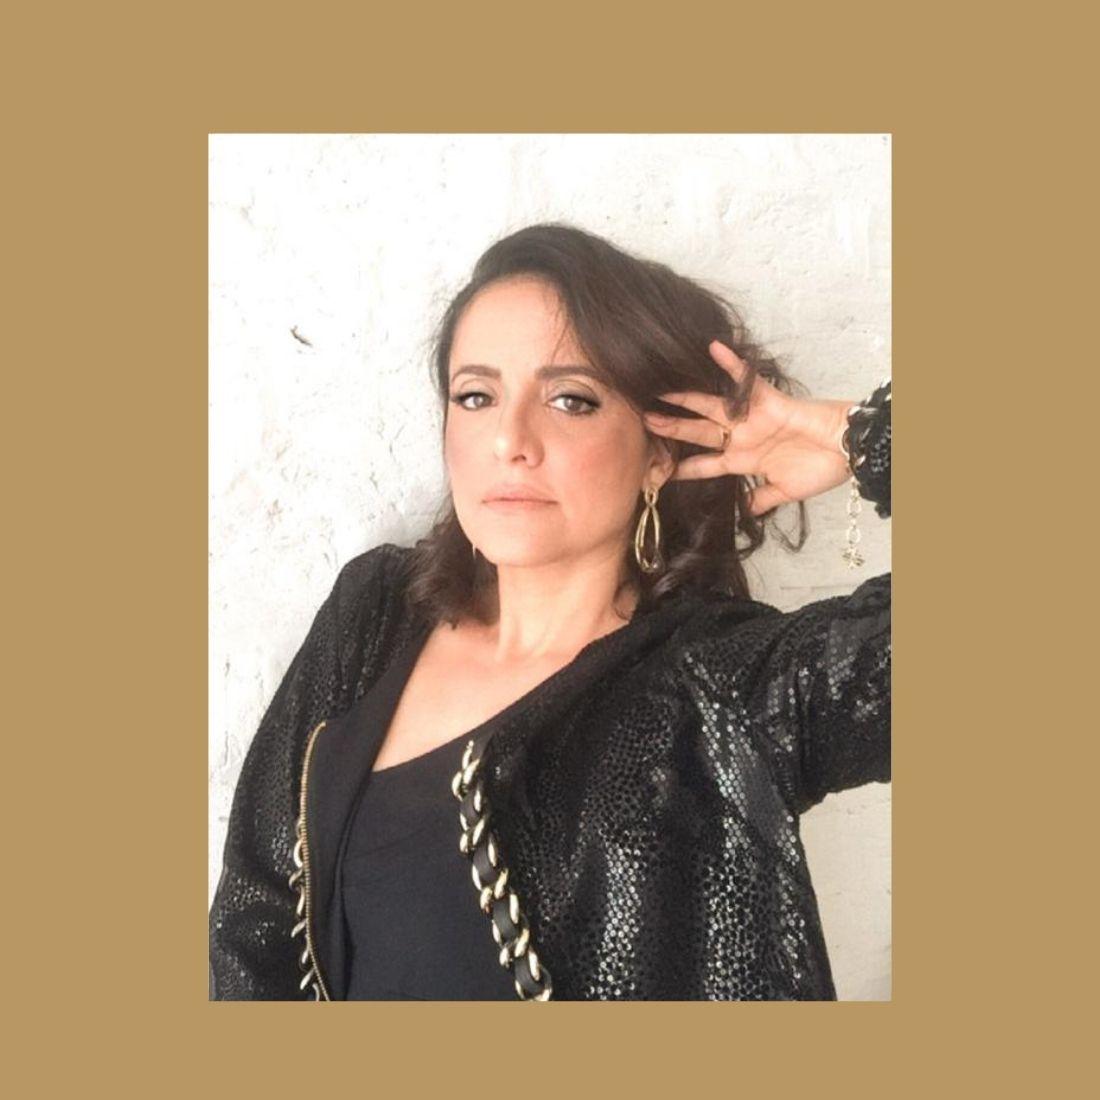 Brinco Dourado Infinit Metal Banhado a Ouro Barbara Strauss